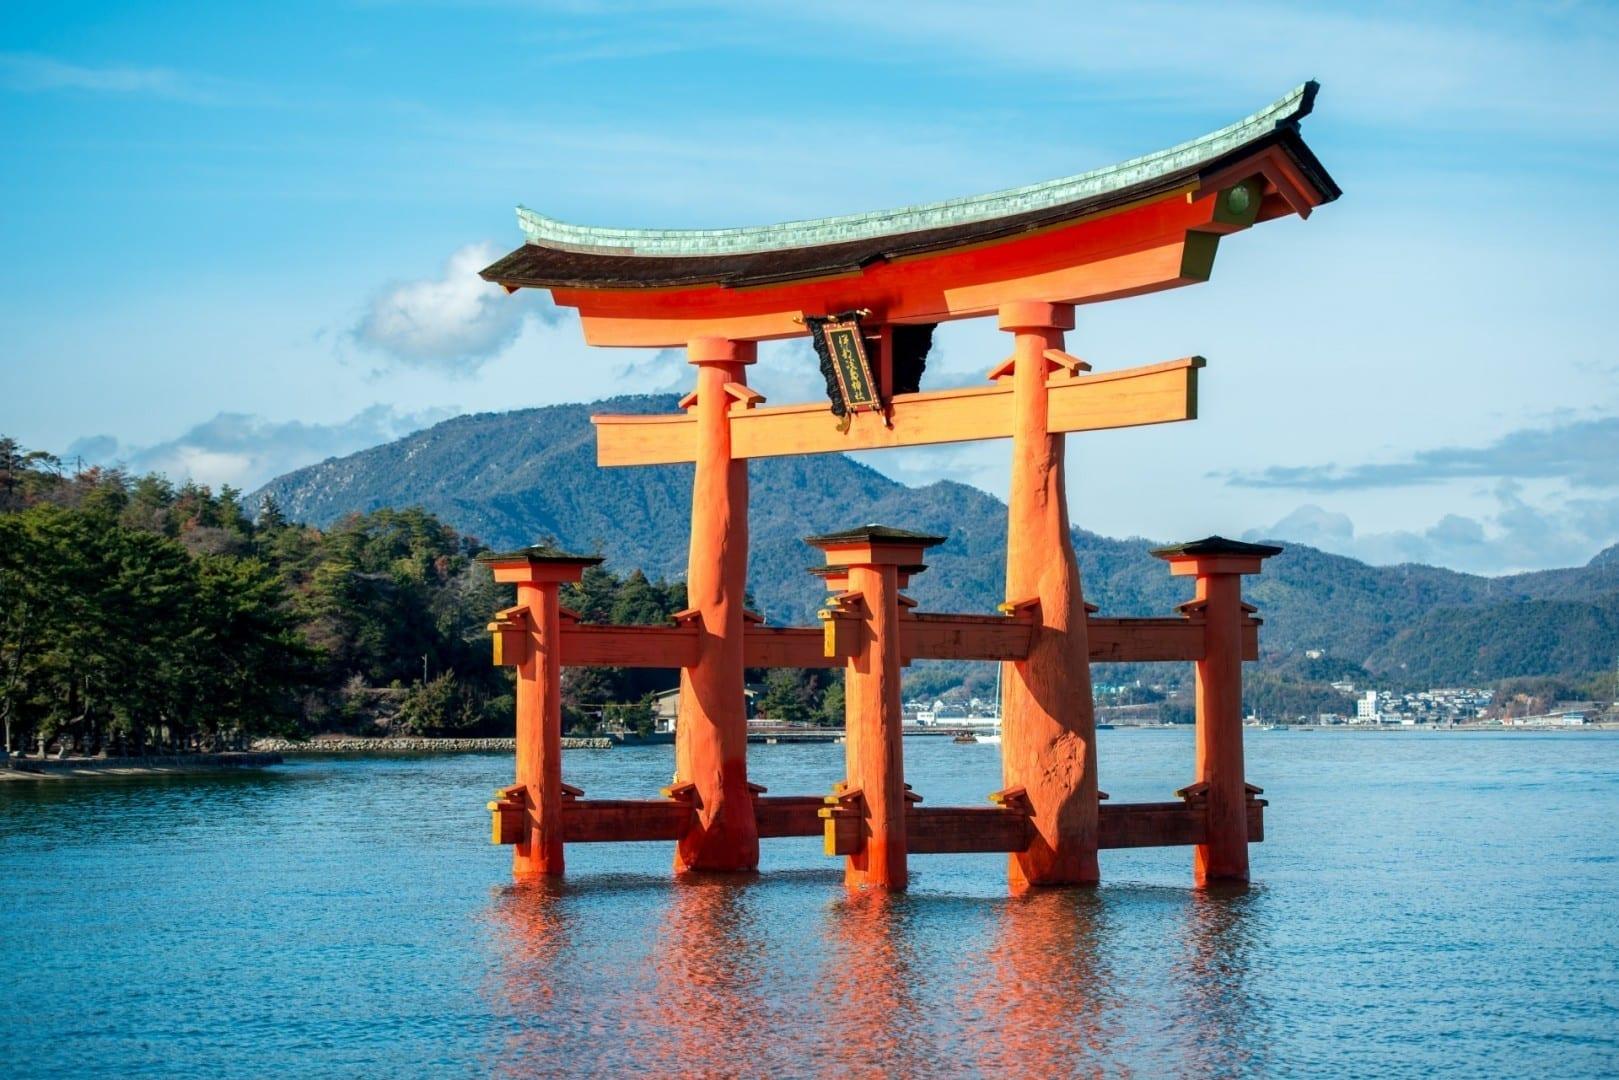 La puerta torii flotante Miyajima Japón